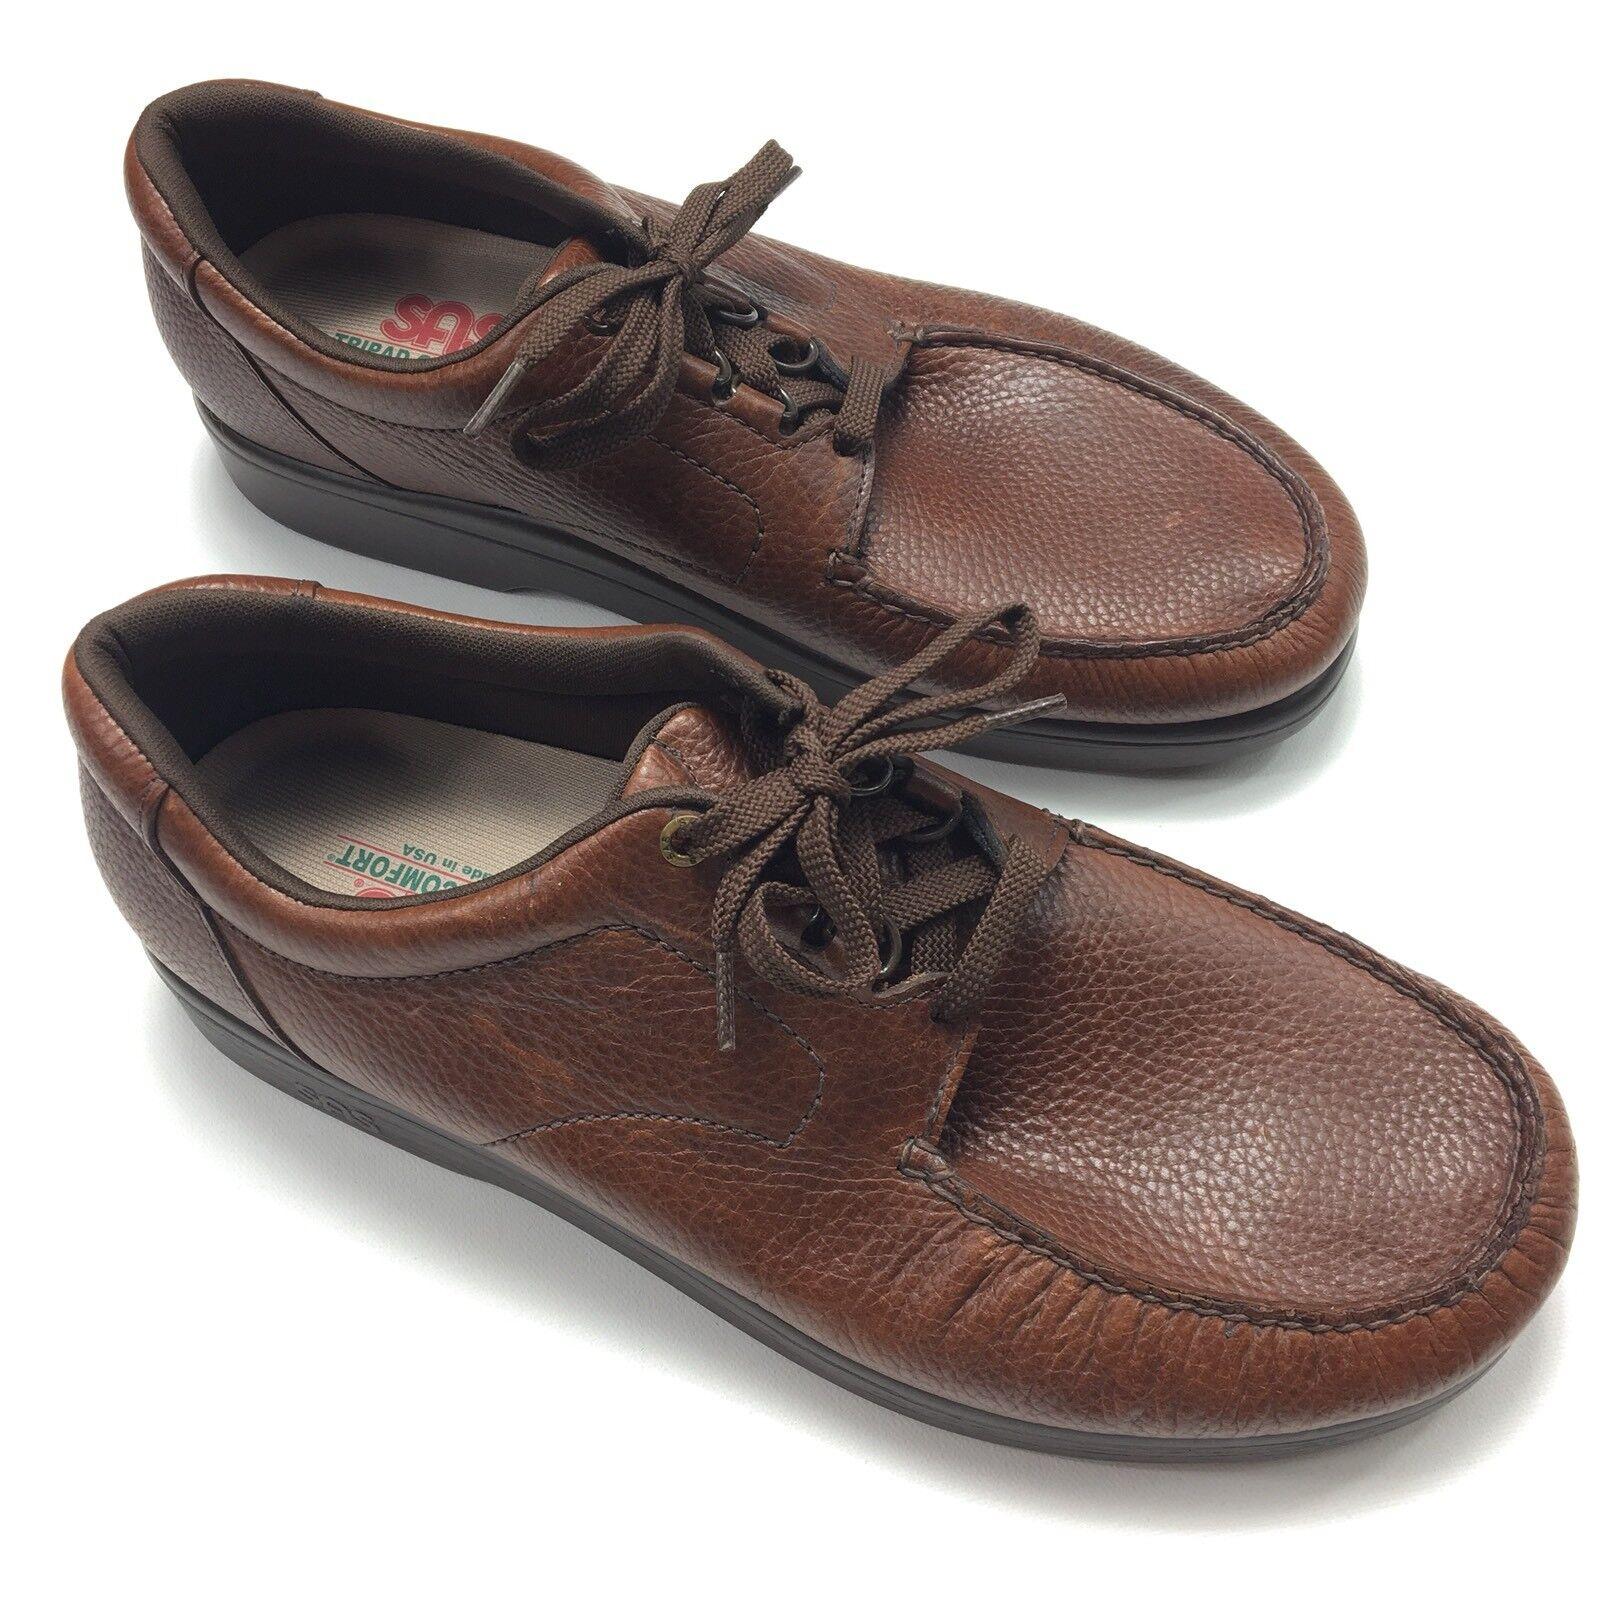 SAS Men's Bout Time Casual Walking shoes Size 14 M Brown Moc Toe